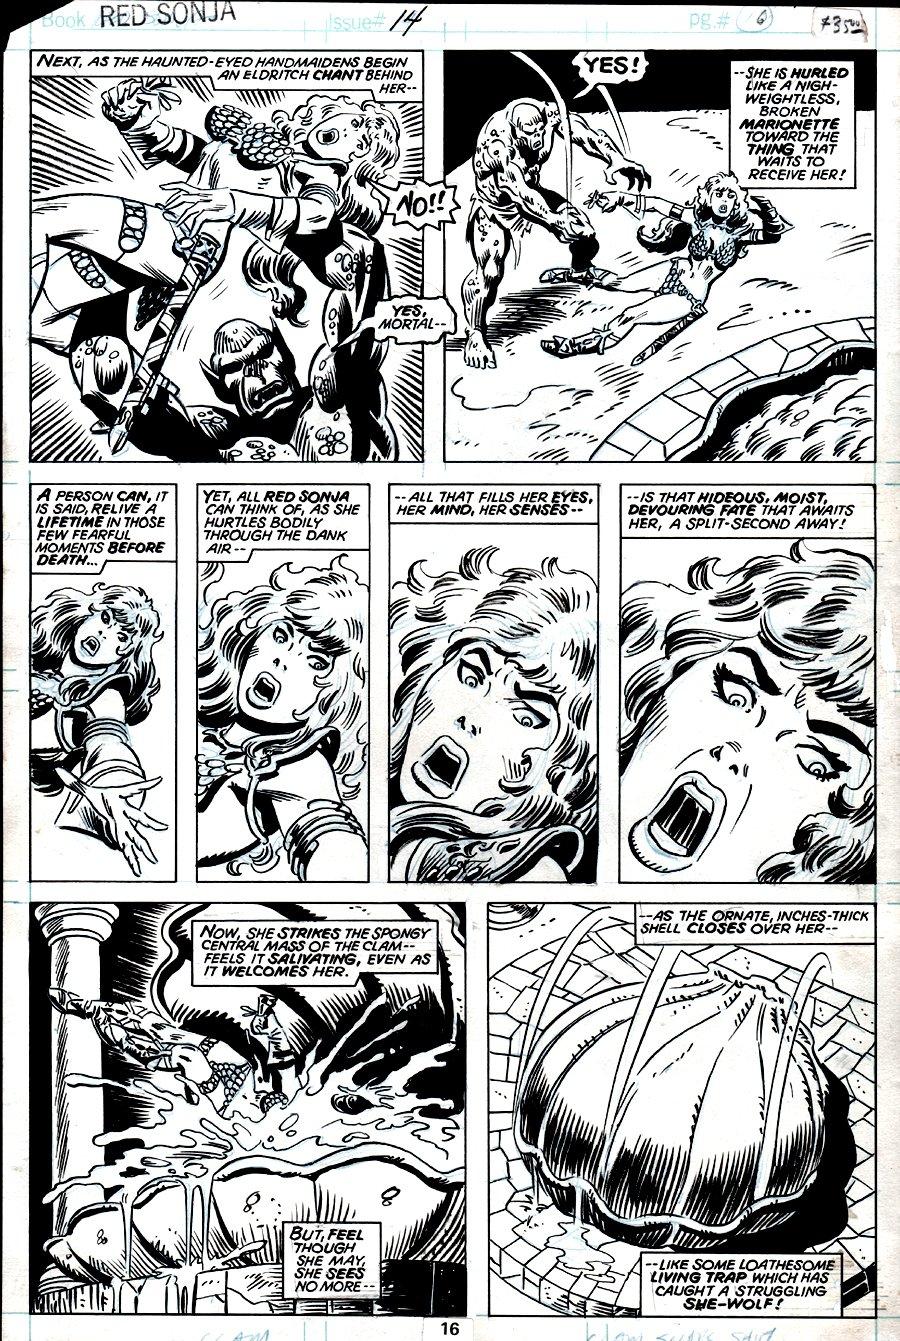 Red Sonja #14 p 16 (RED SONJA BATTLING IN 6 OF 7 PANELS!) 1978